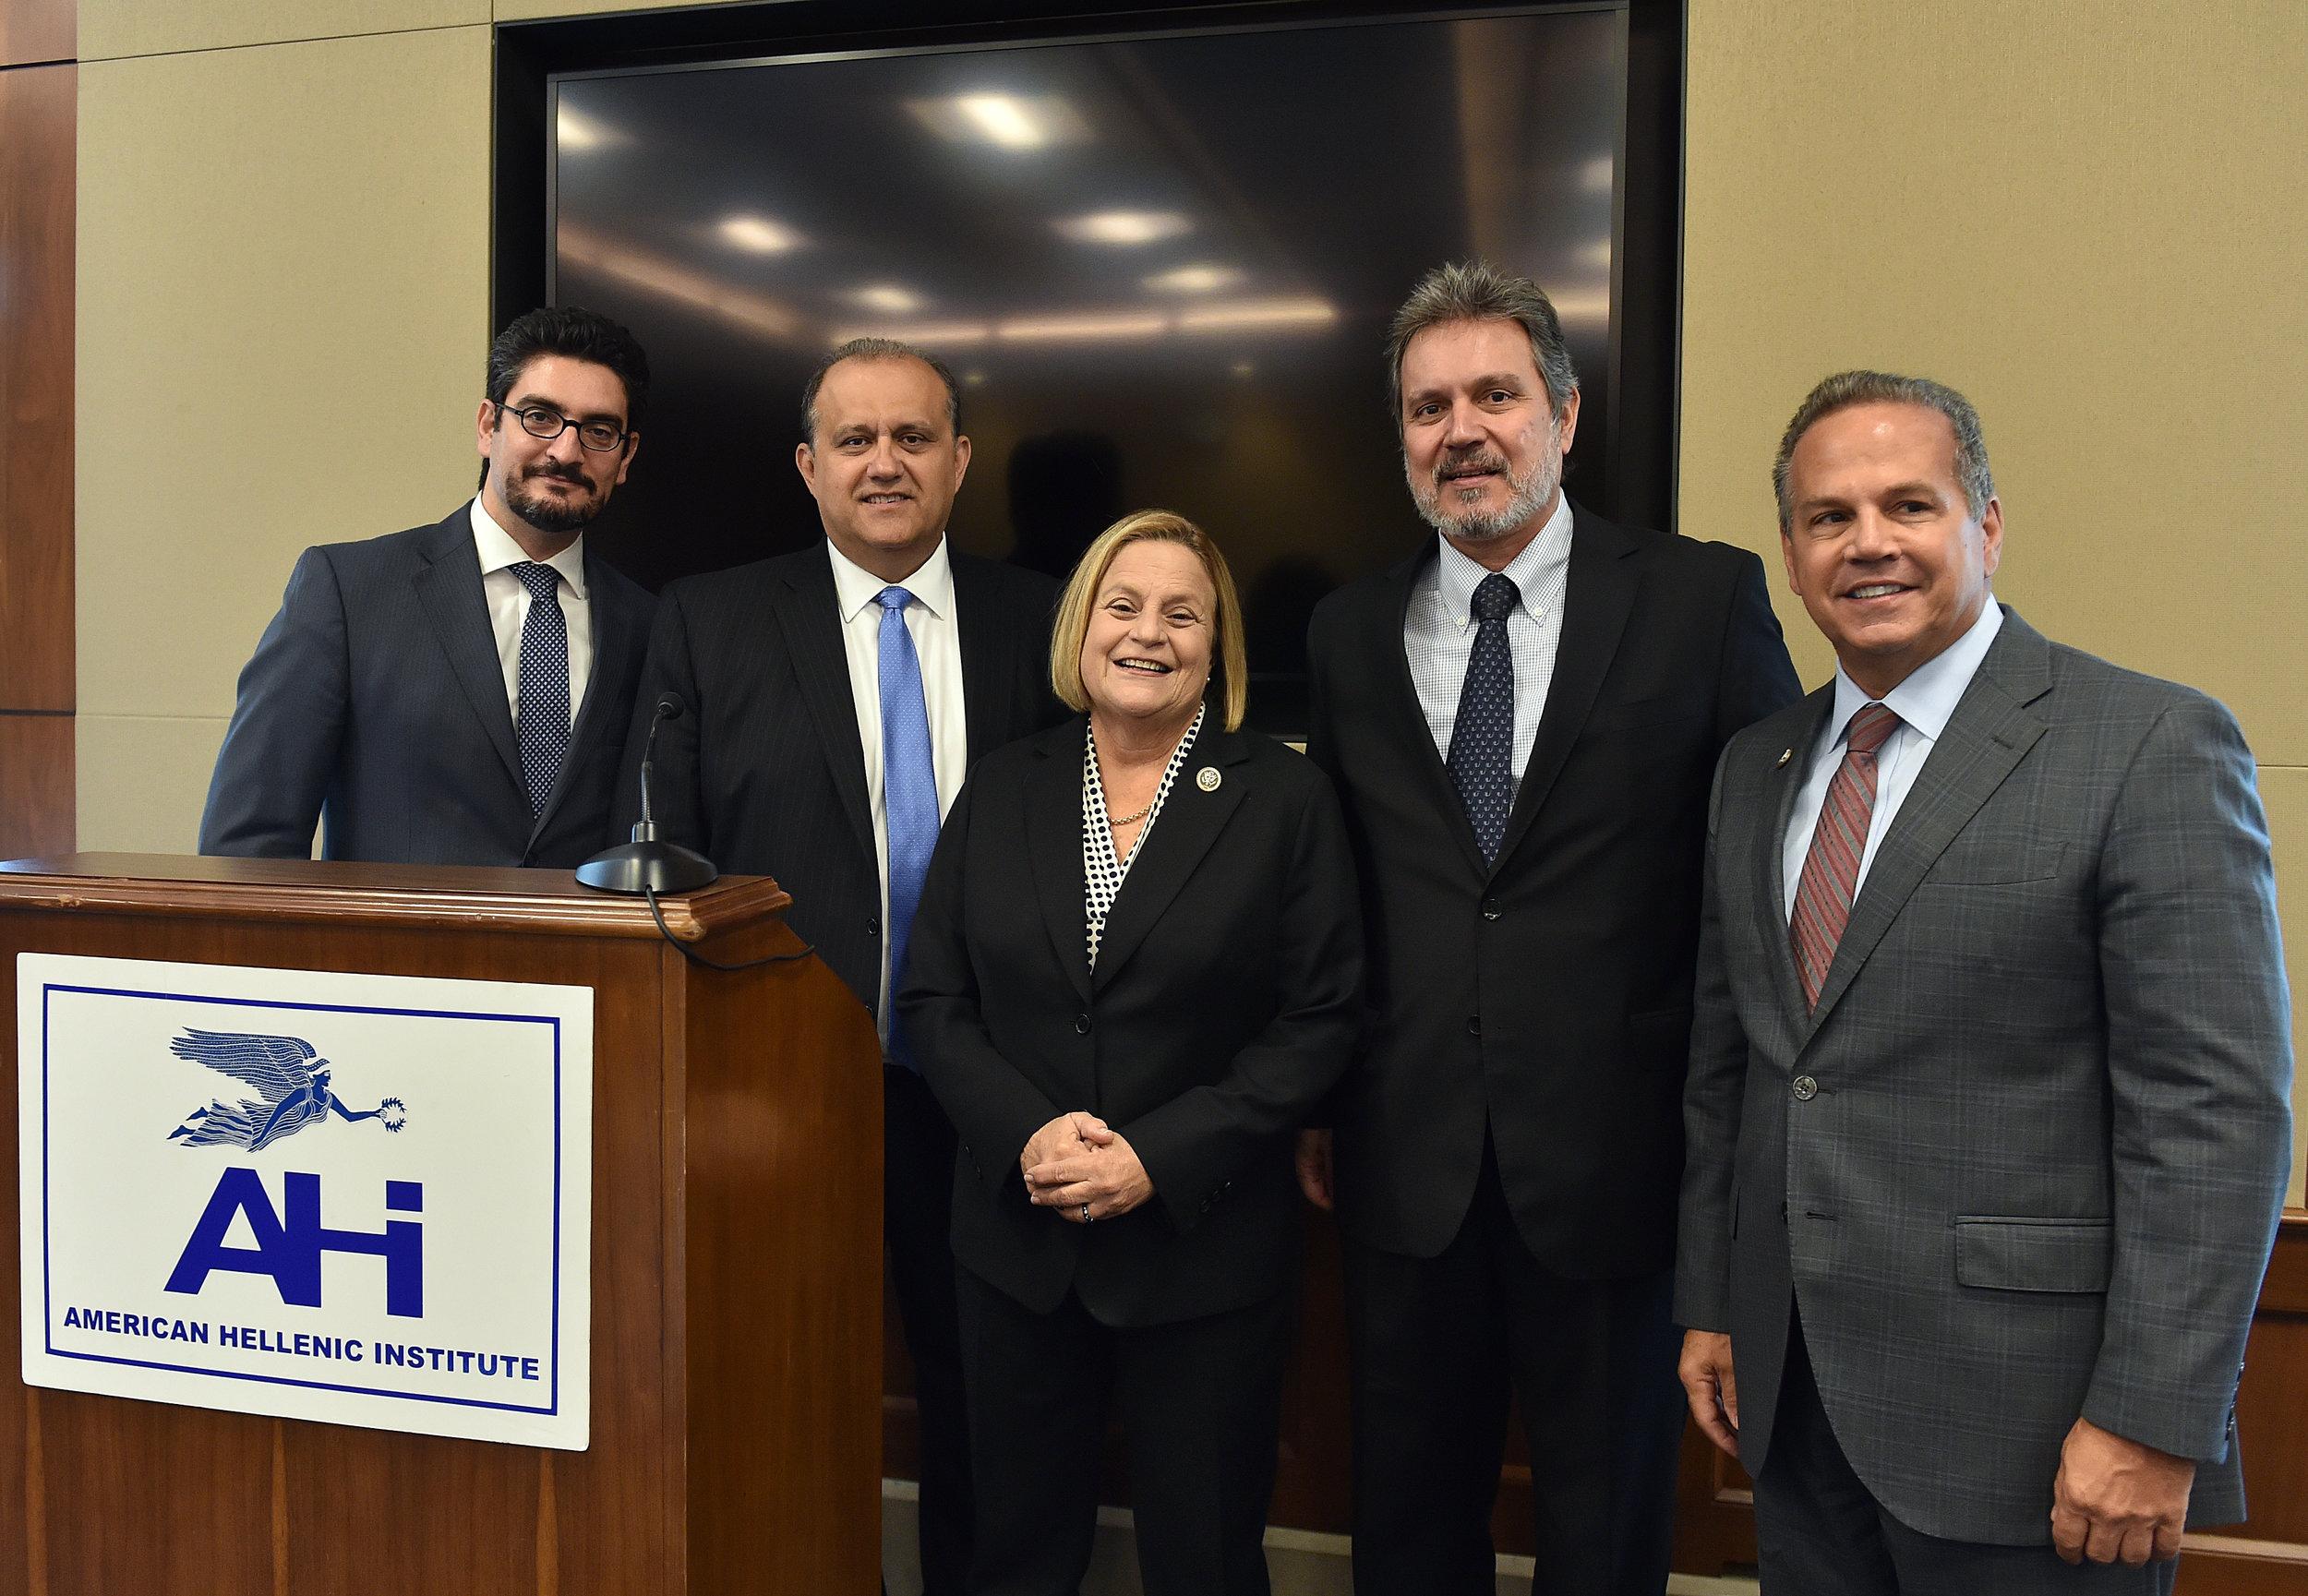 (L-R) Mr. Konstantinos Polykarpou, Consul, Embassy of Cyprus; Nick Larigakis, President, AHI; Rep. Ileana Ros-Lehtinen (R-FL);  Haris Lalacos, Ambassador of Greece to the U.S.A. ; Rep. David Cicilline (D-RI).